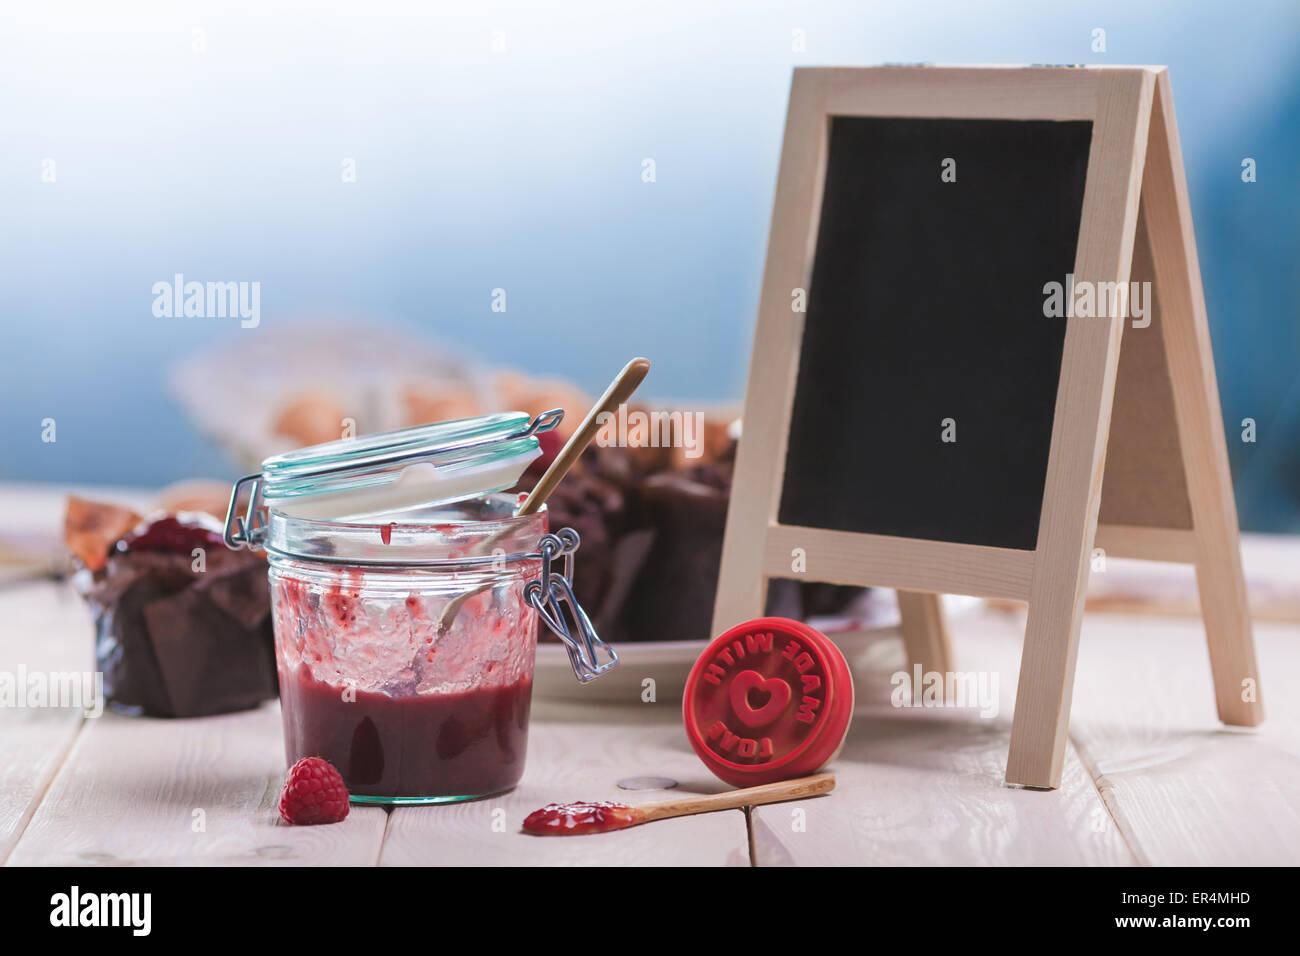 Raspberry jam on wooden planks with empty blackboard. Debica, Poland - Stock Image